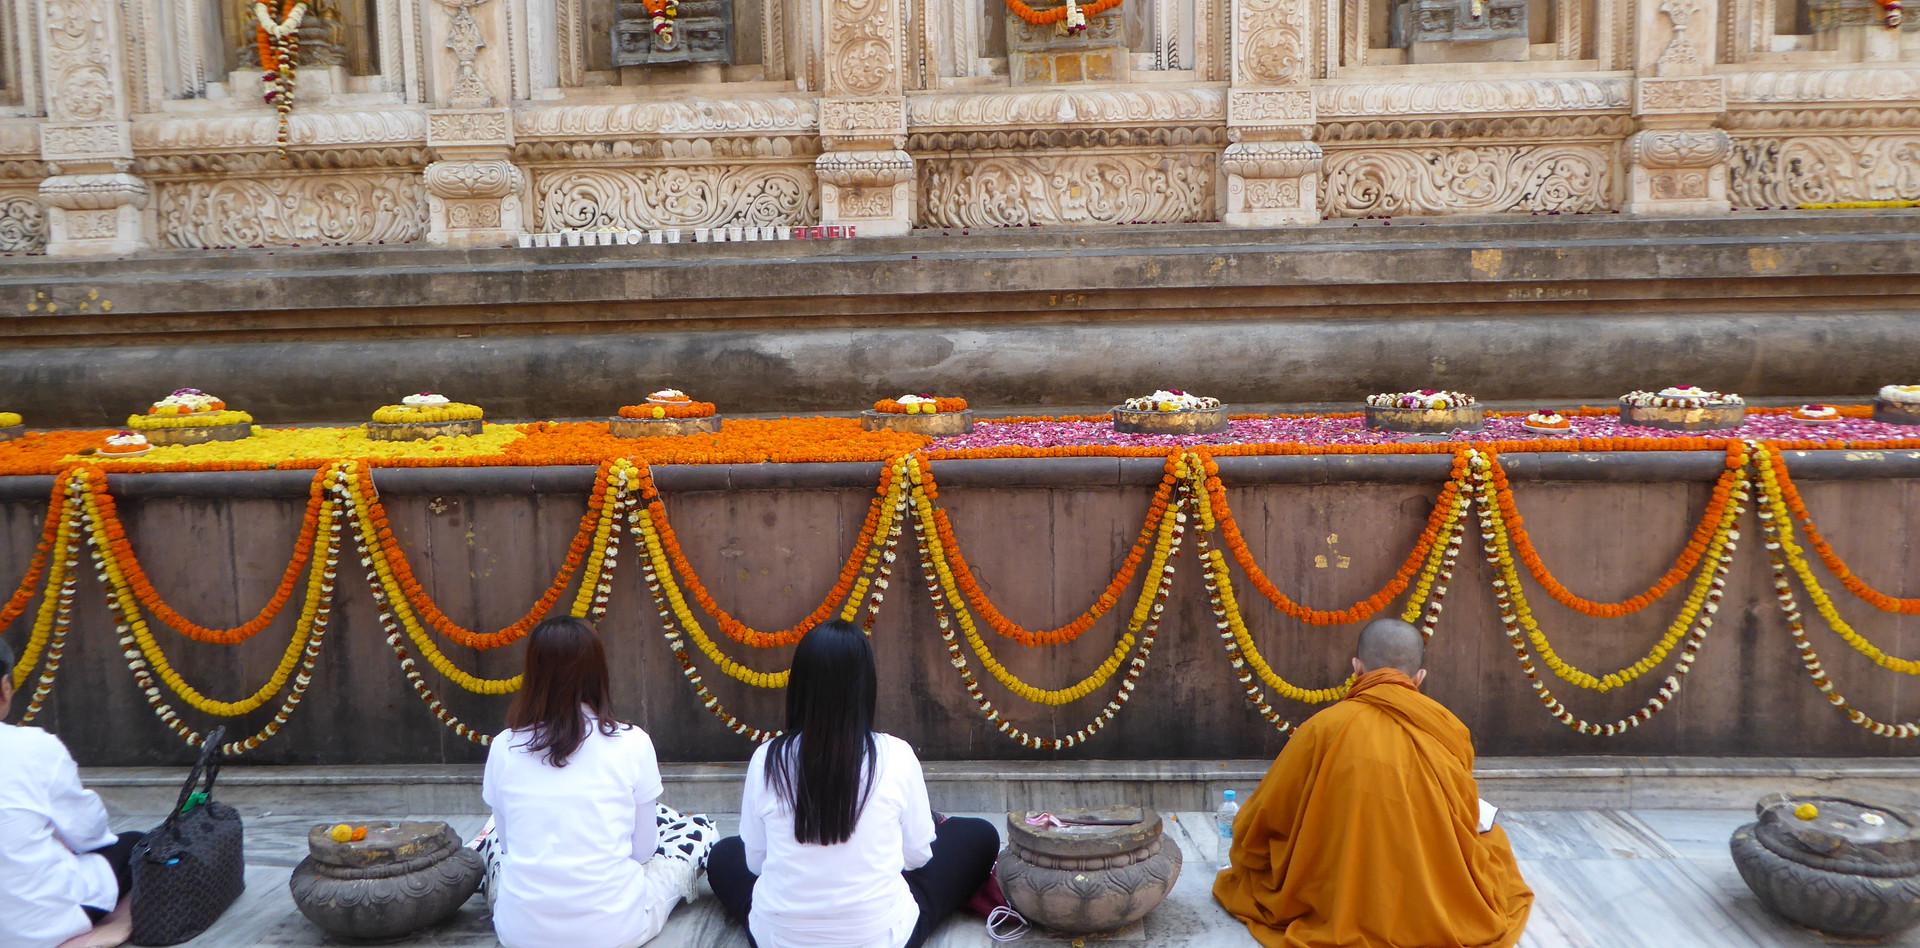 Praying to the Buddhas